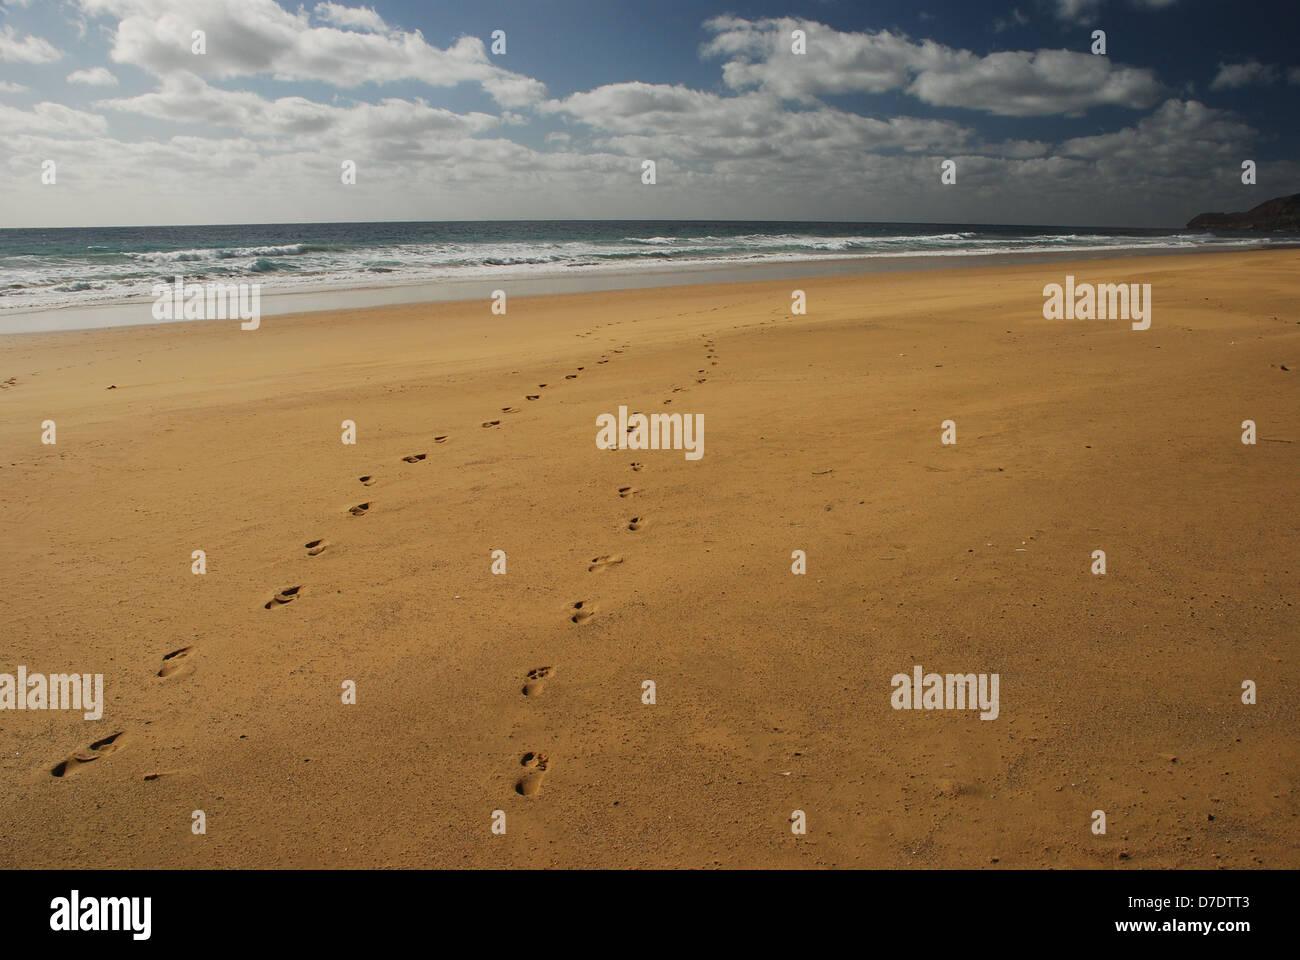 Footprints on the beach. Porto Santo. Portugal - Stock Image